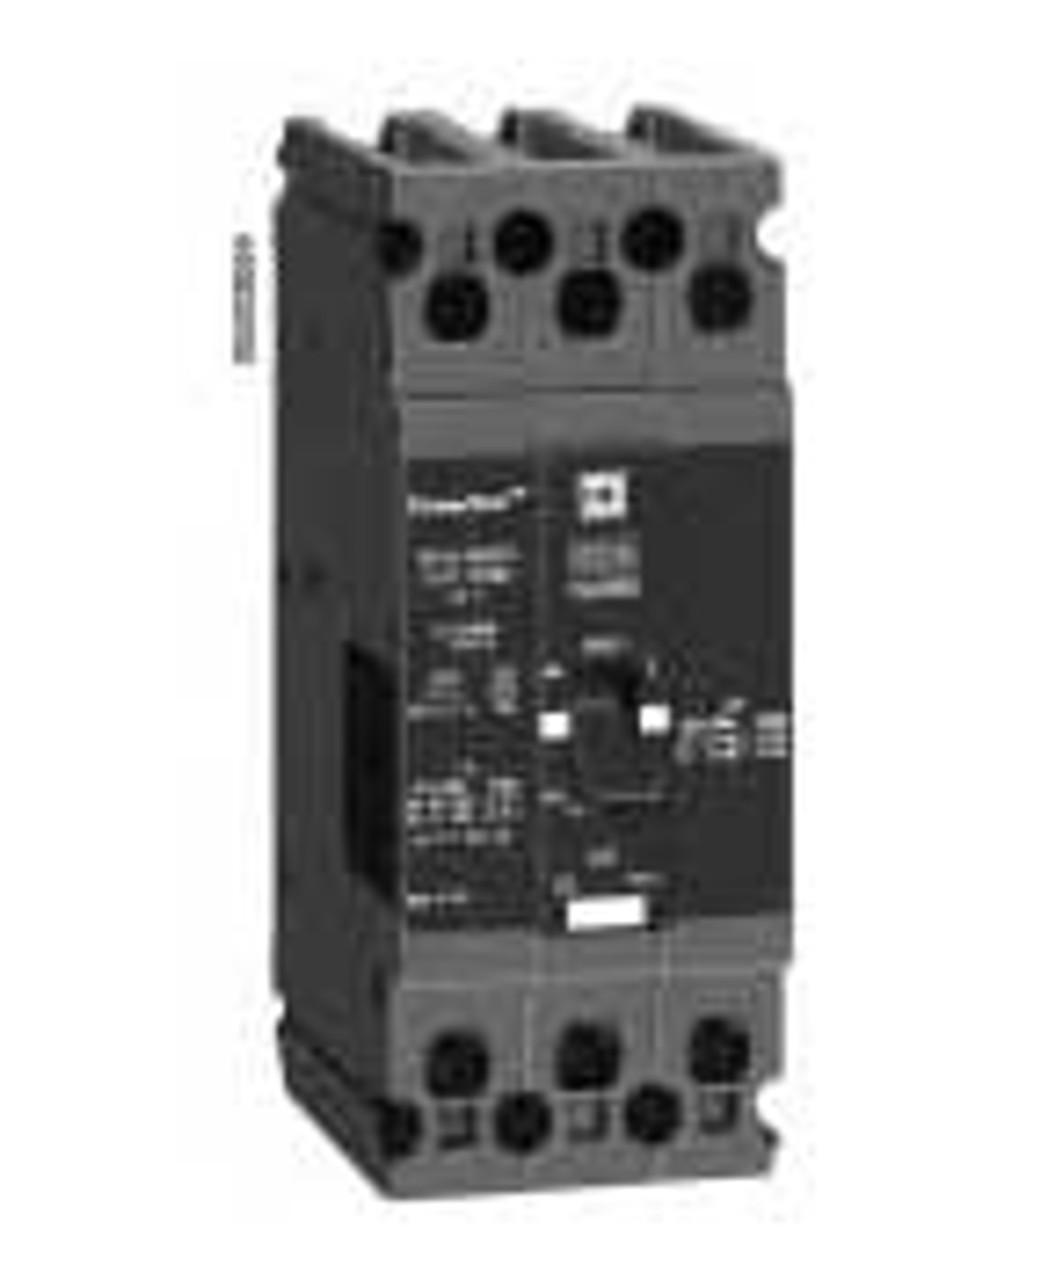 Square D FDA34020 3 Pole 20 Amp 480 VAC MC Circuit Breaker - Used